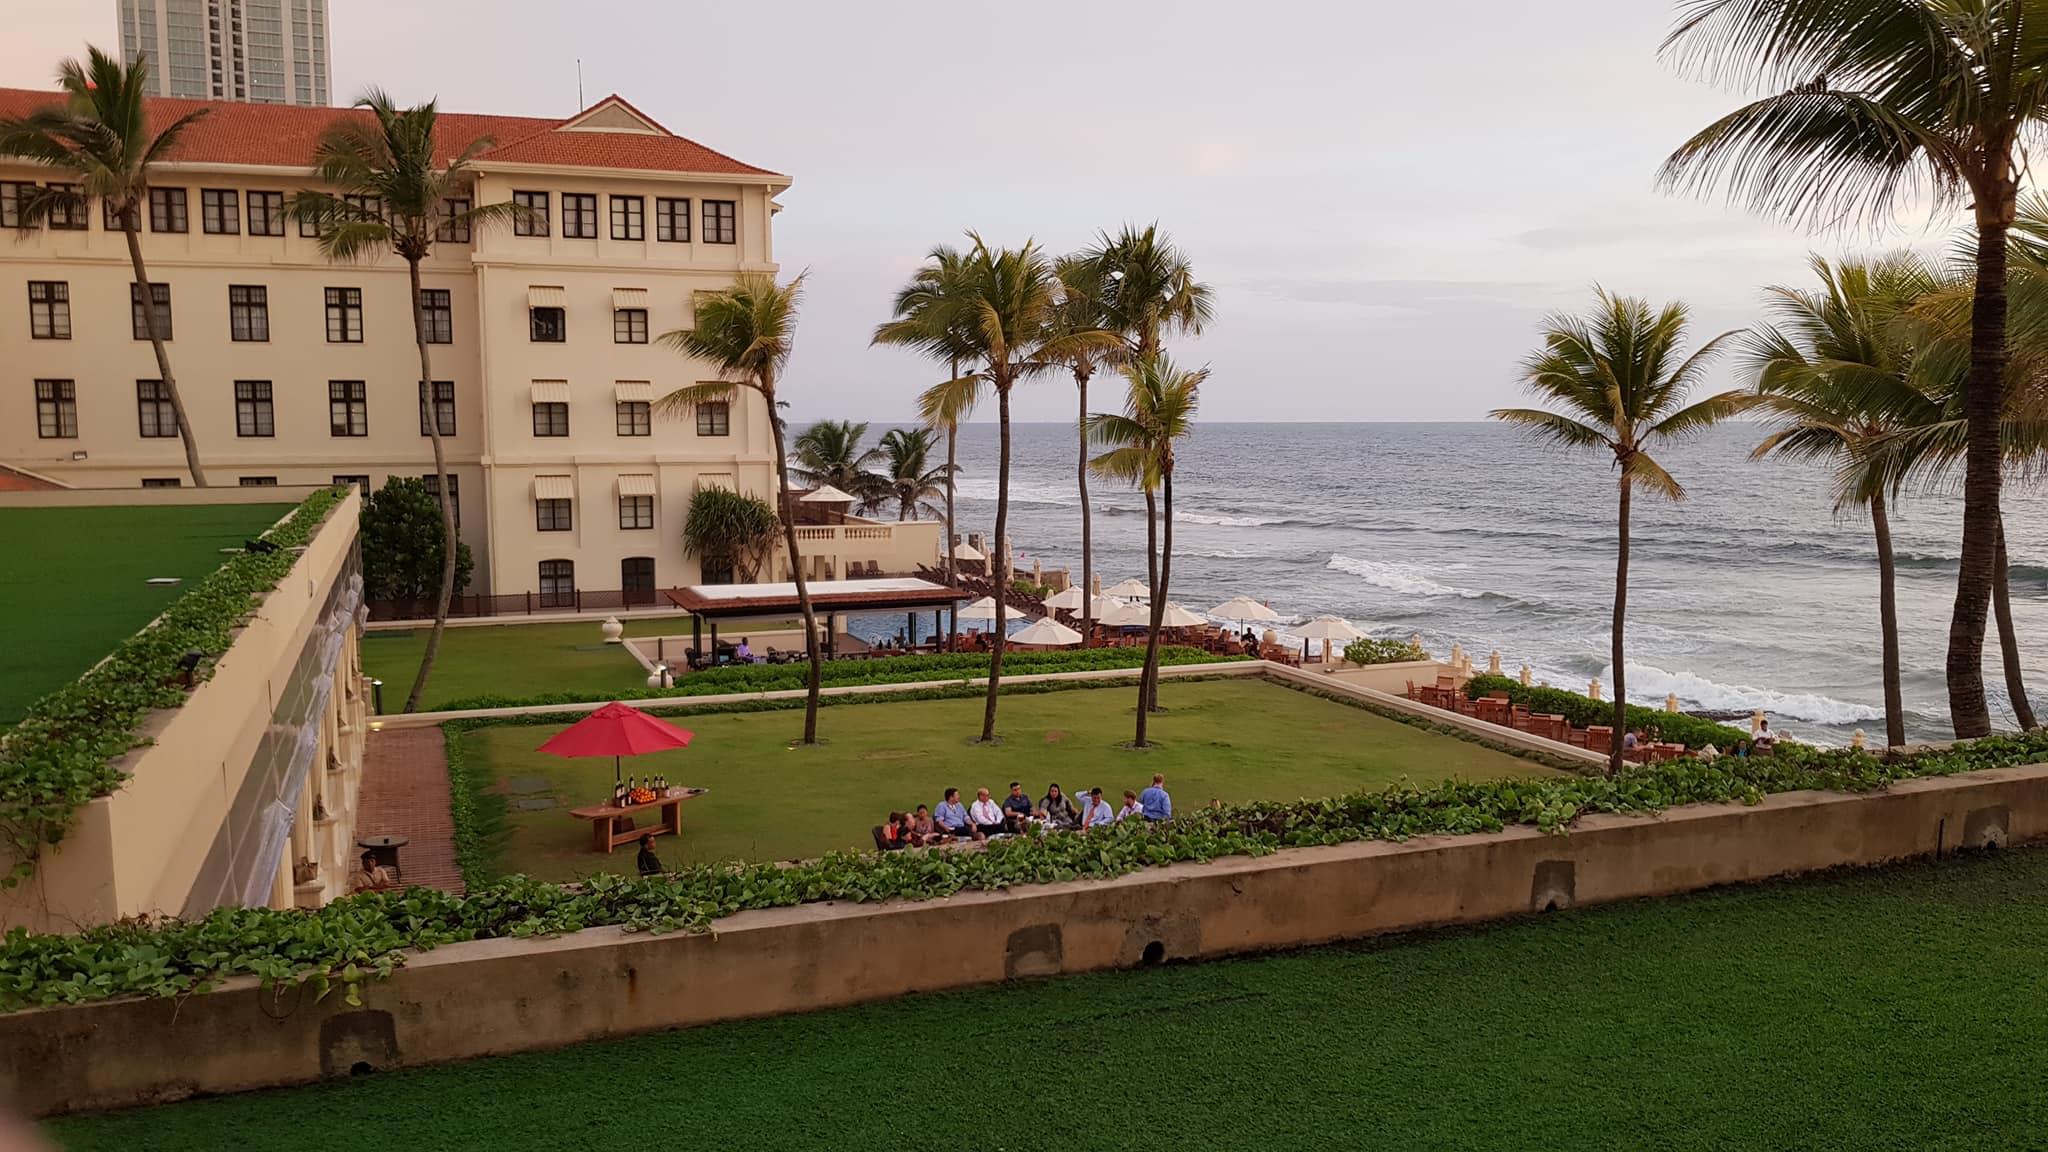 invite-to-paradise-sri-lanka-maldives-holiday-honeymoon-specialists-customer-guest-feedback-zane-lisa-butcher-colombo-galle-face-hotel-sea-view.jpg